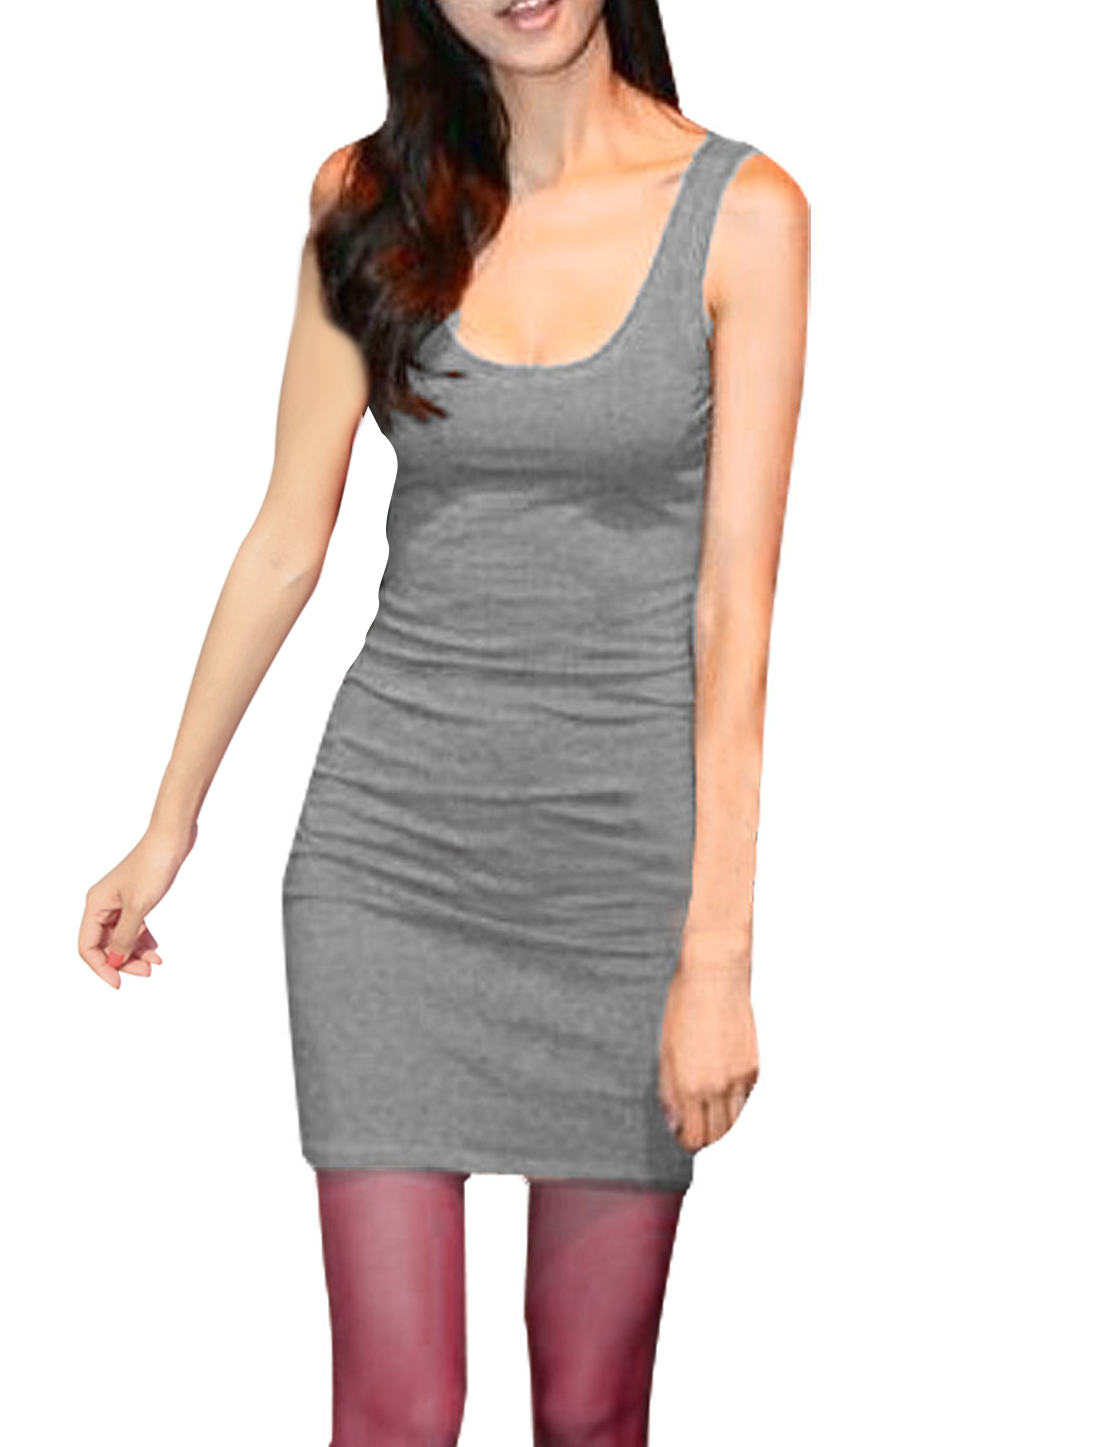 Solid Gray Sleeveless Slim Mini Dress XS for Ladies